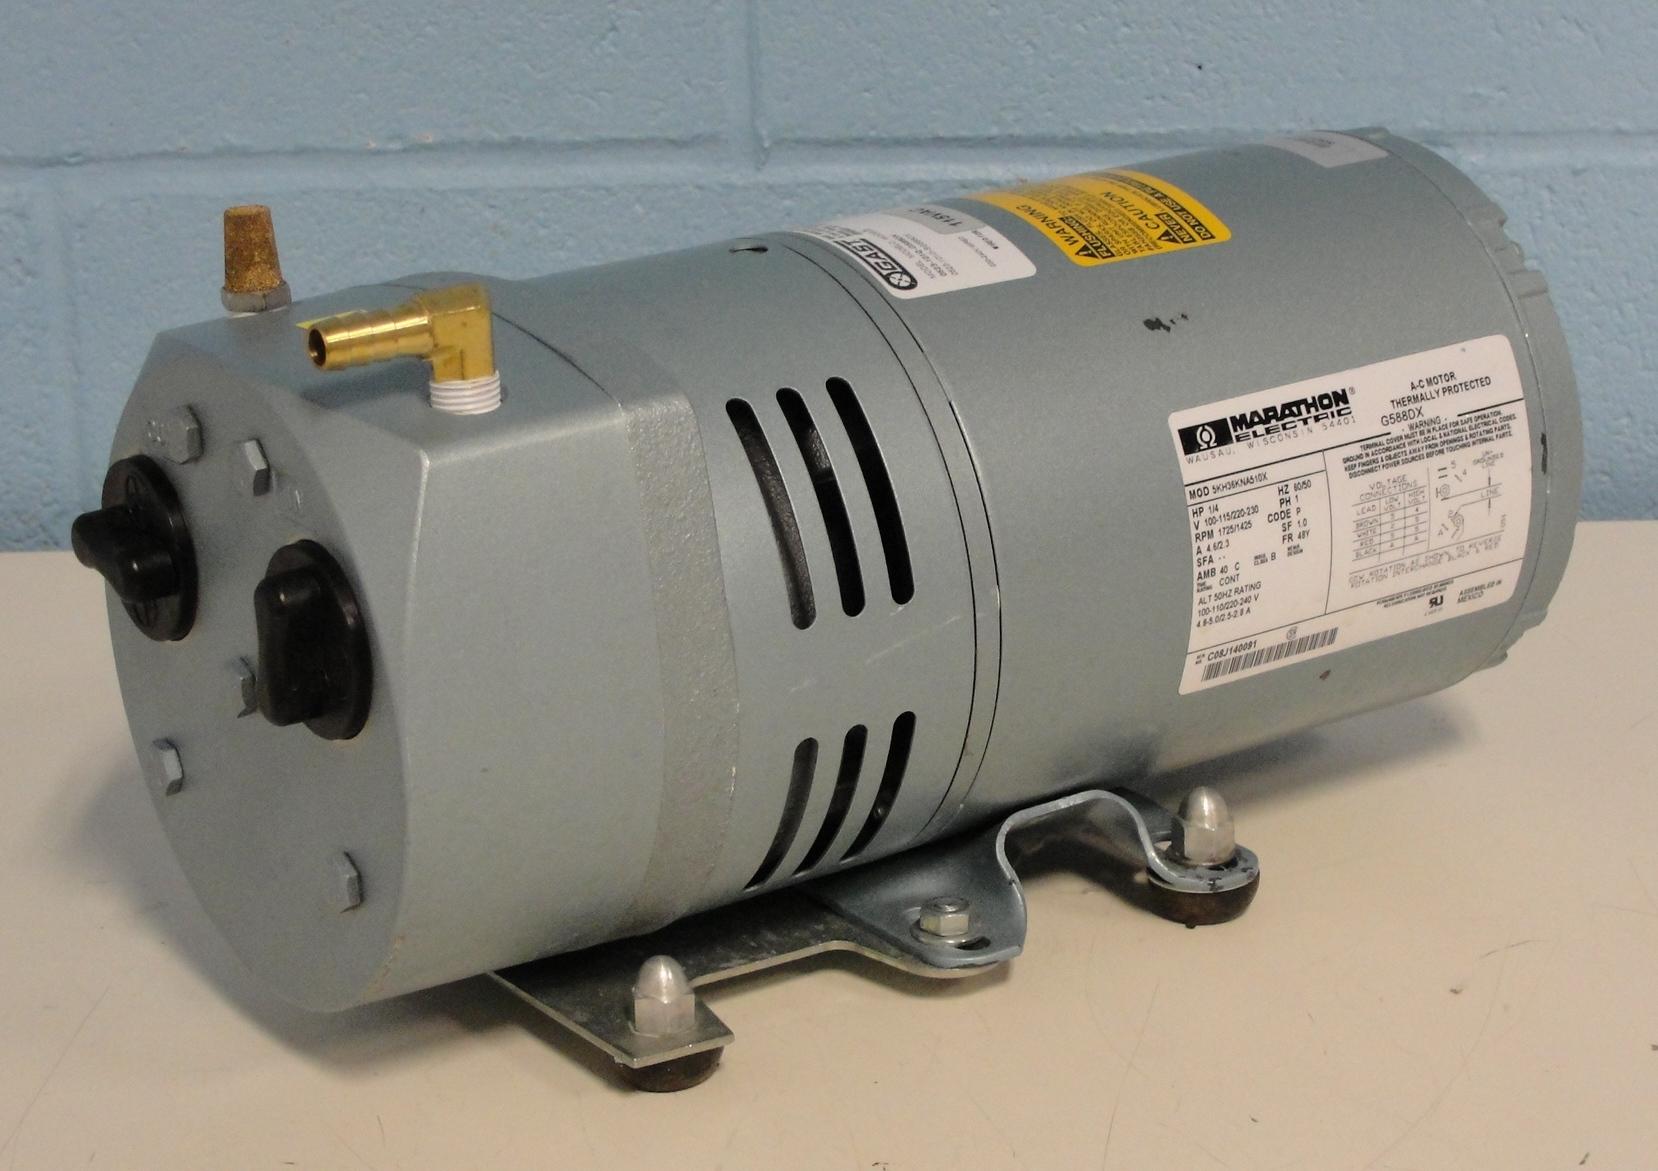 Refurbished Gast Oilless Rotary Vane Vacuum Pump Wire Diagram Image